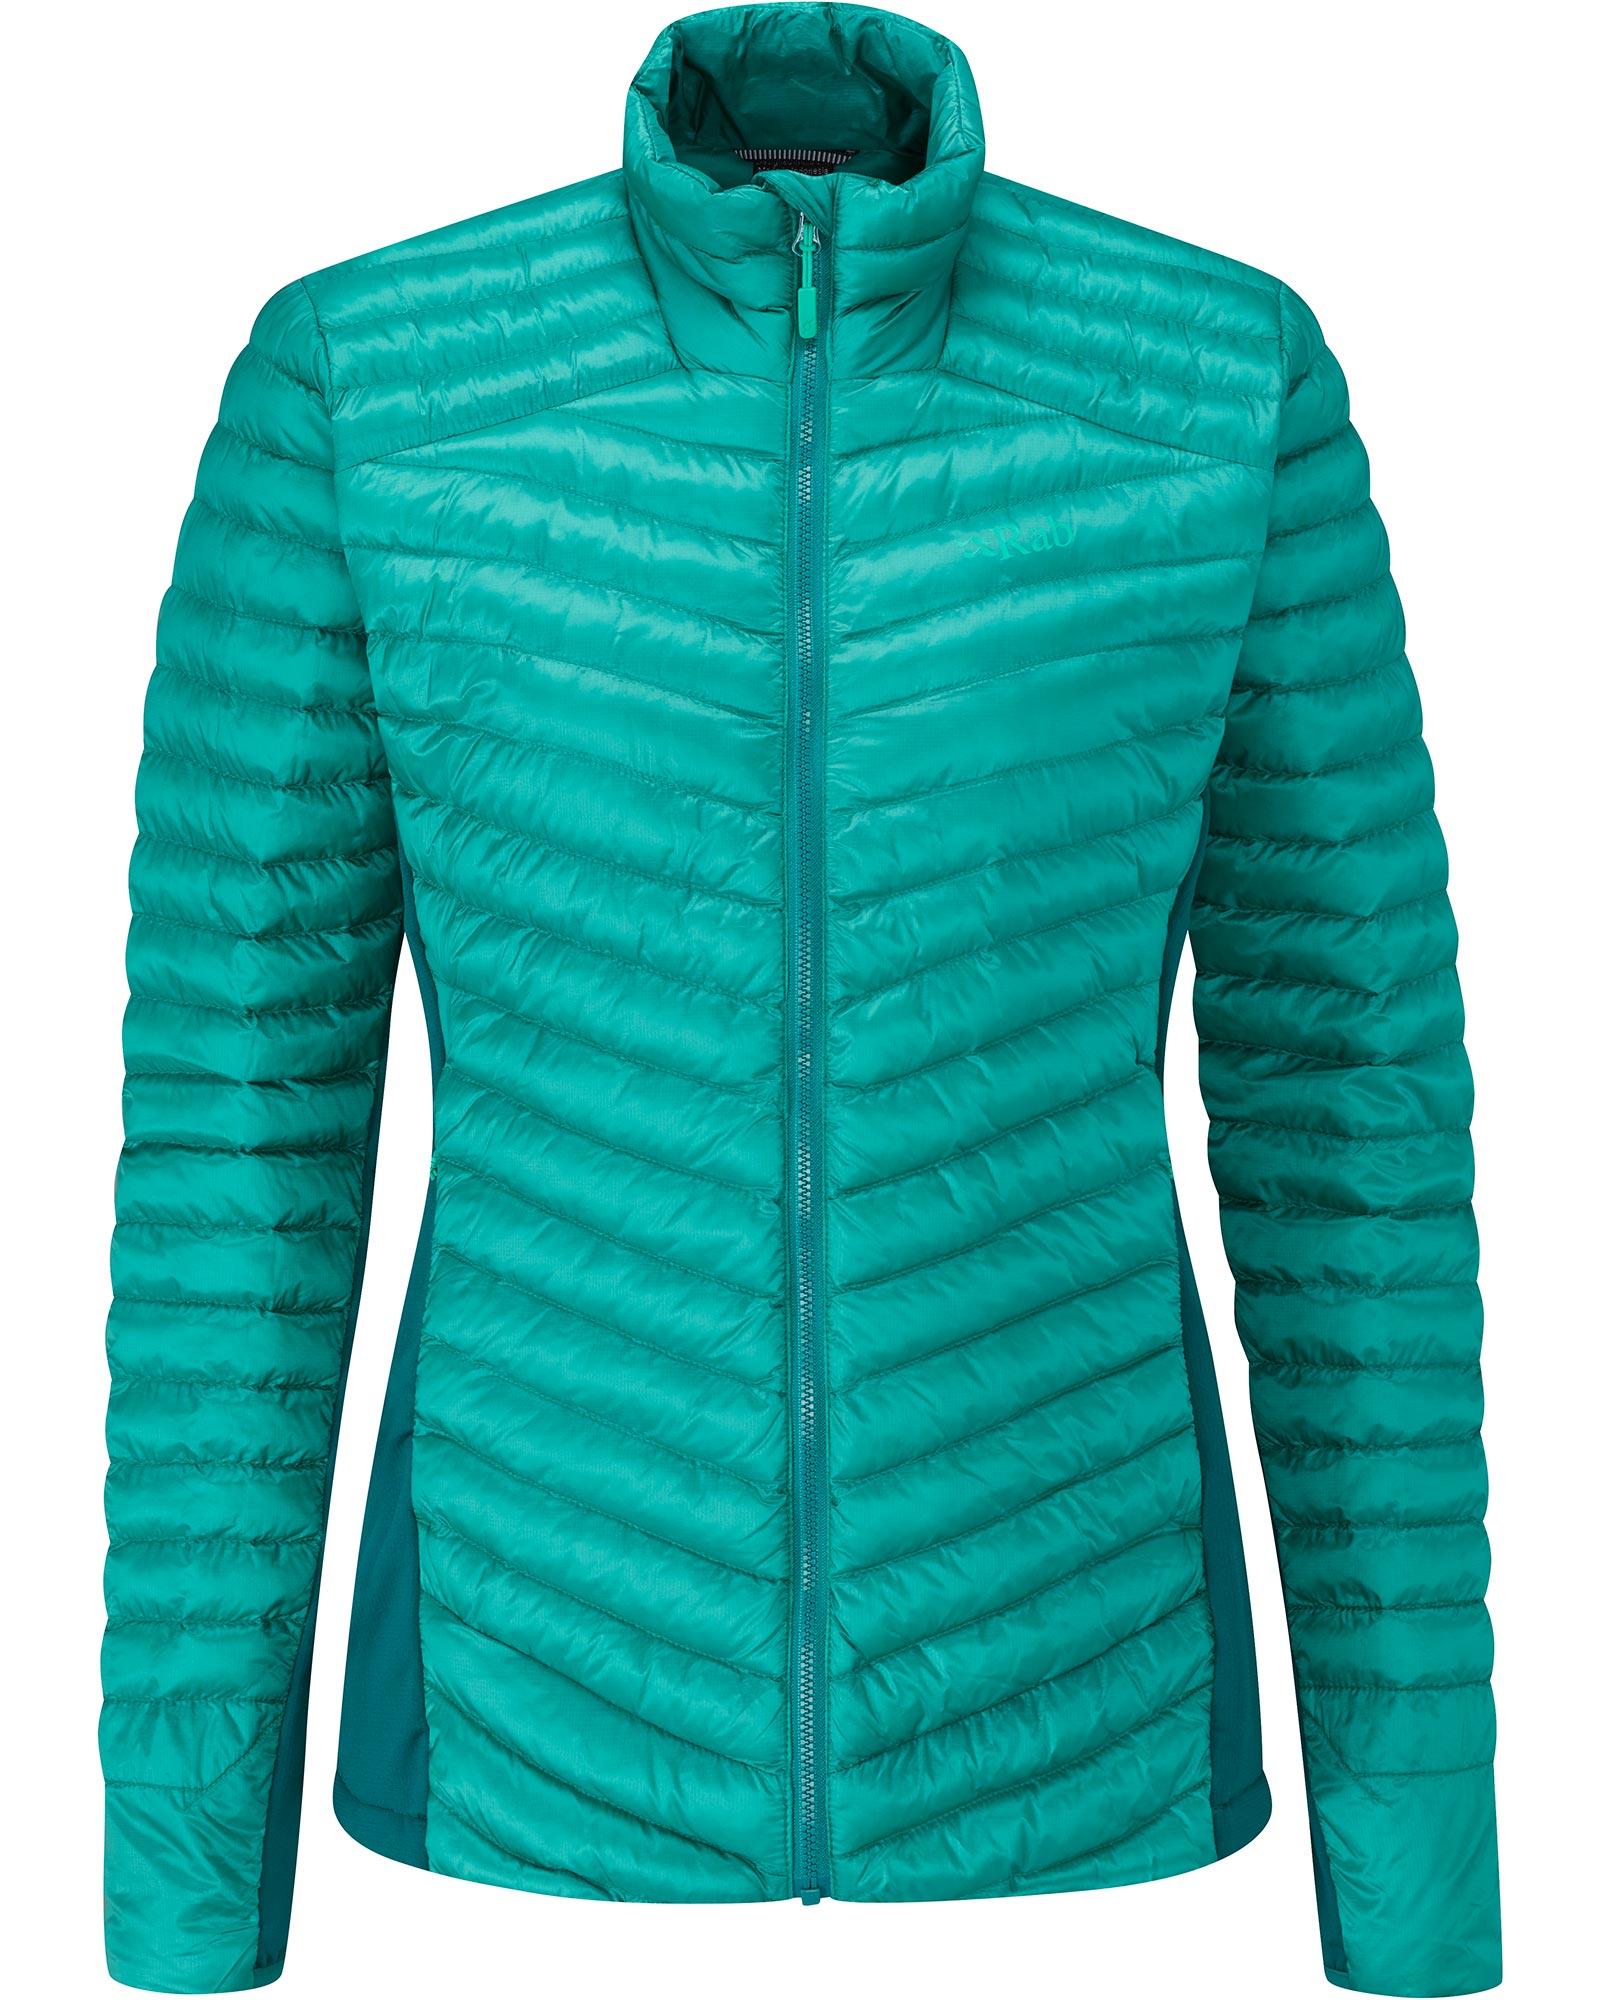 Rab Cirrus Flex 2.0 Women's Jacket 0